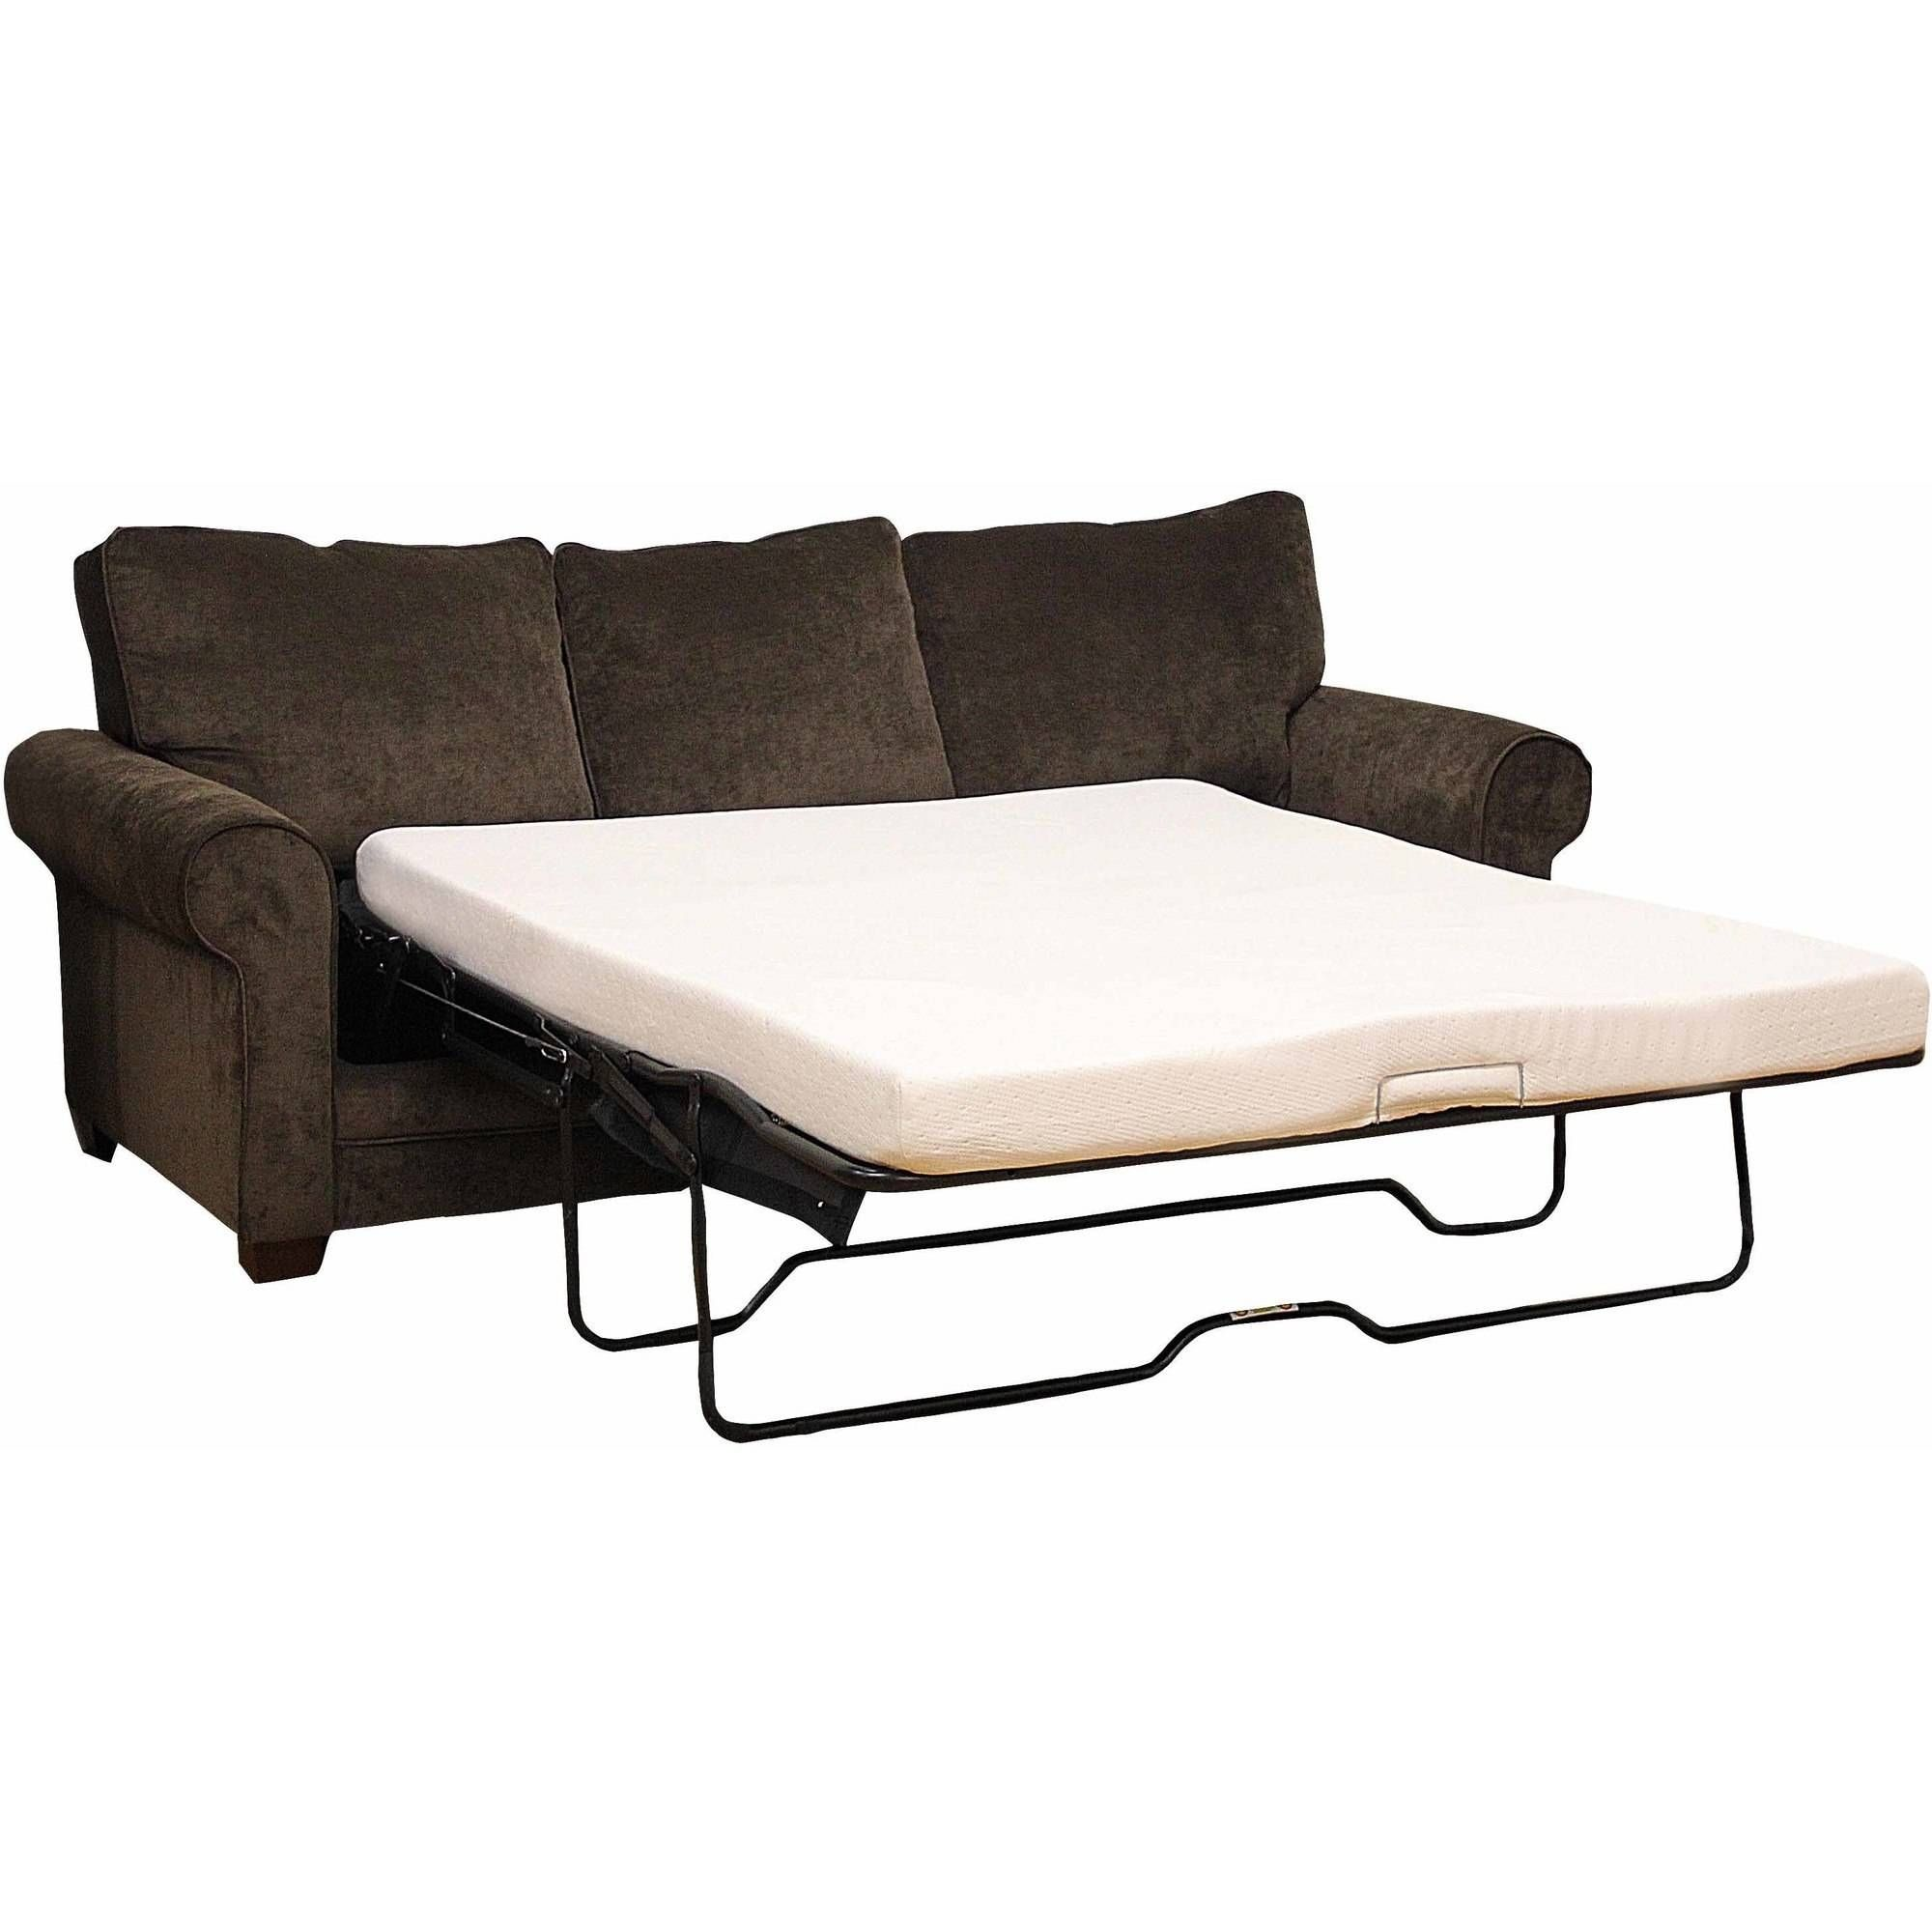 Under Sofa Bed Mattress Support